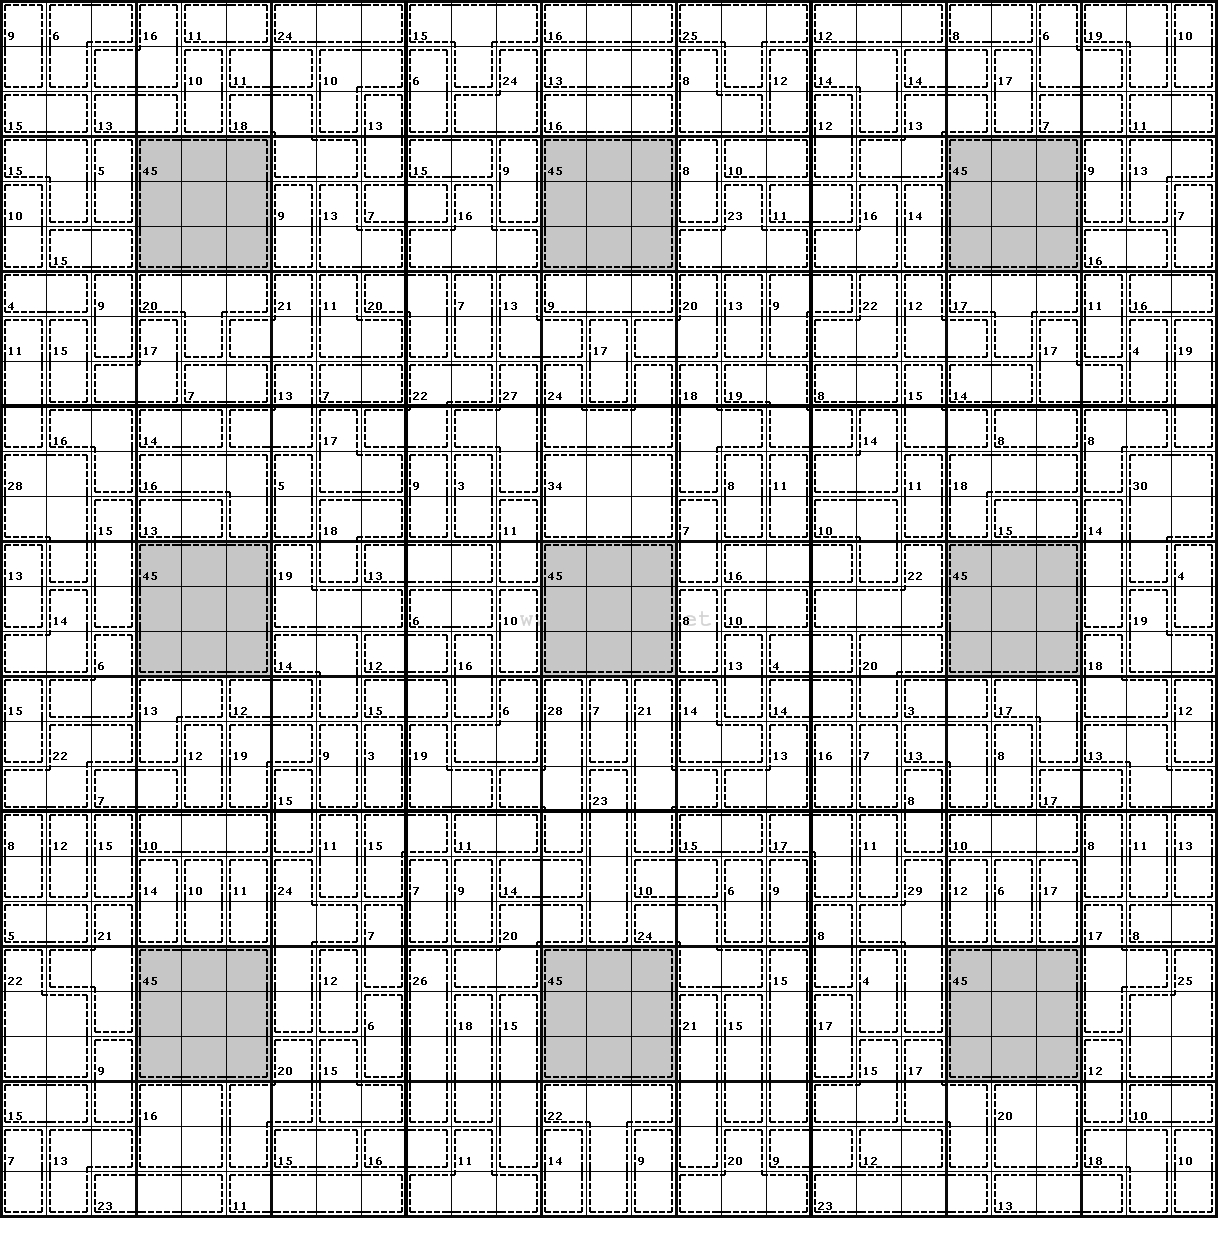 Clueless Killer Sudoku #2 - Killer Sudoku Free Printable